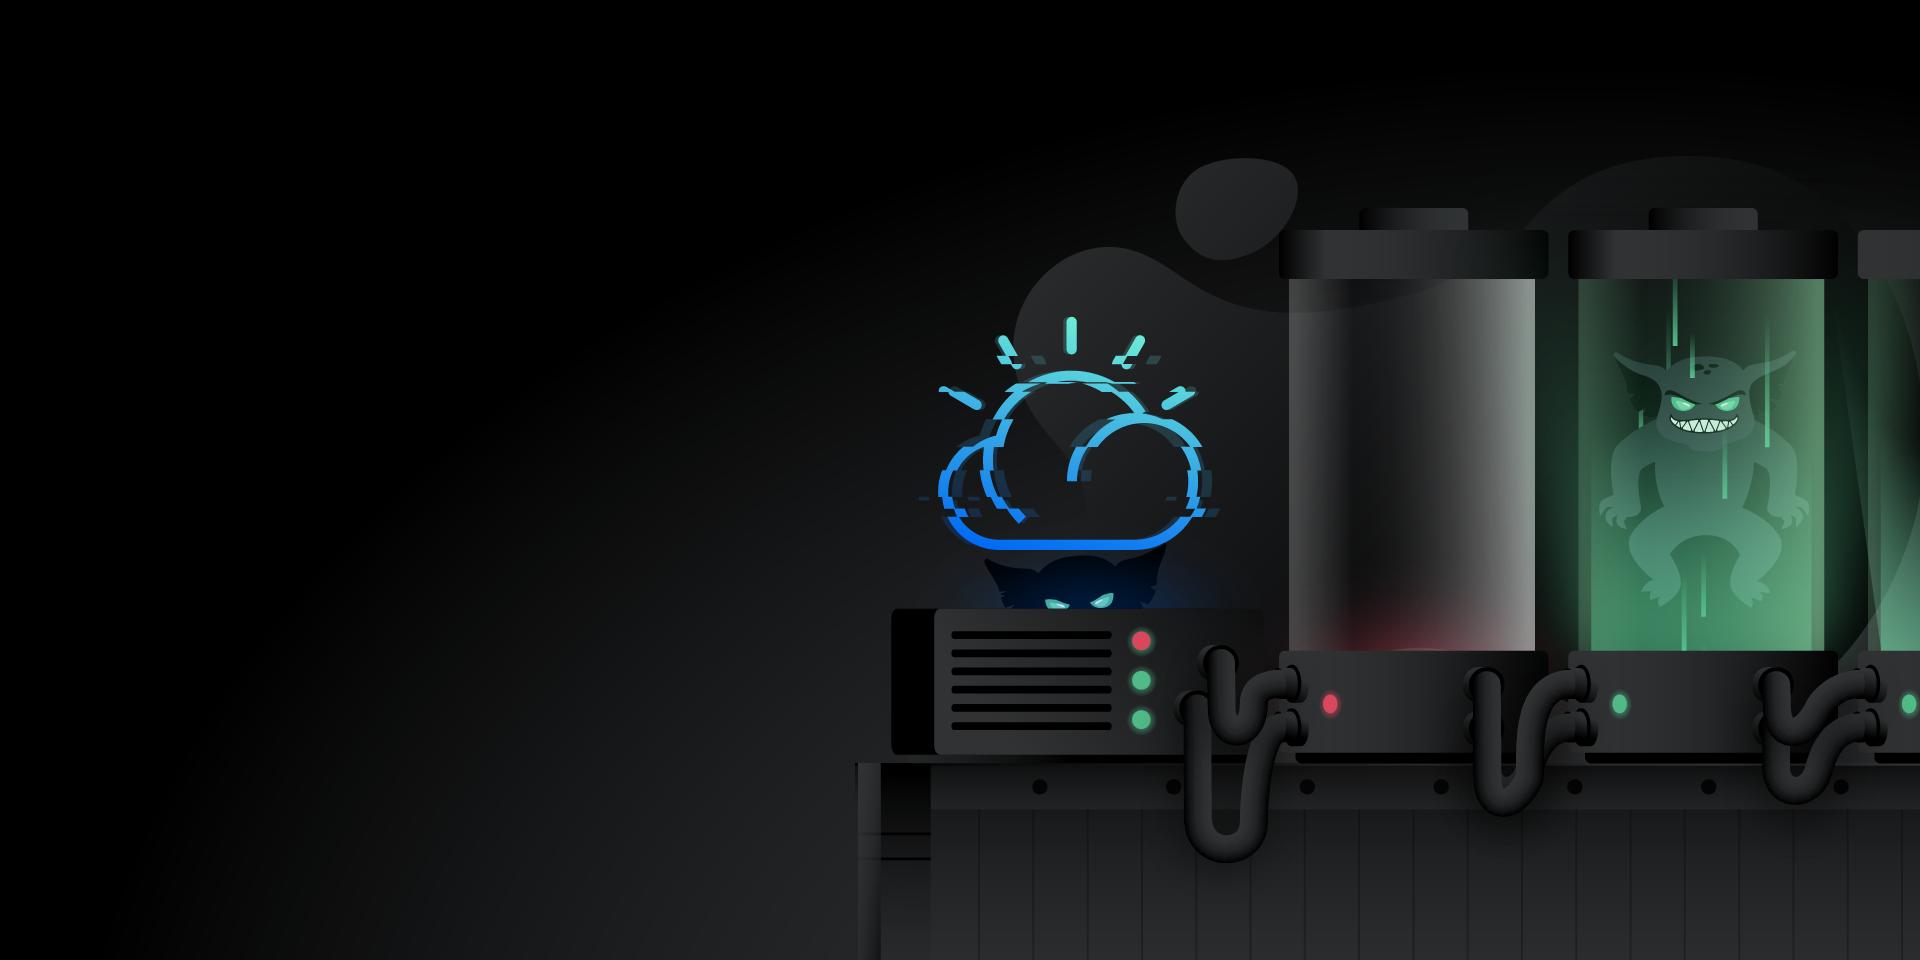 Chaos Engineering using Gremlin on IBM Cloud